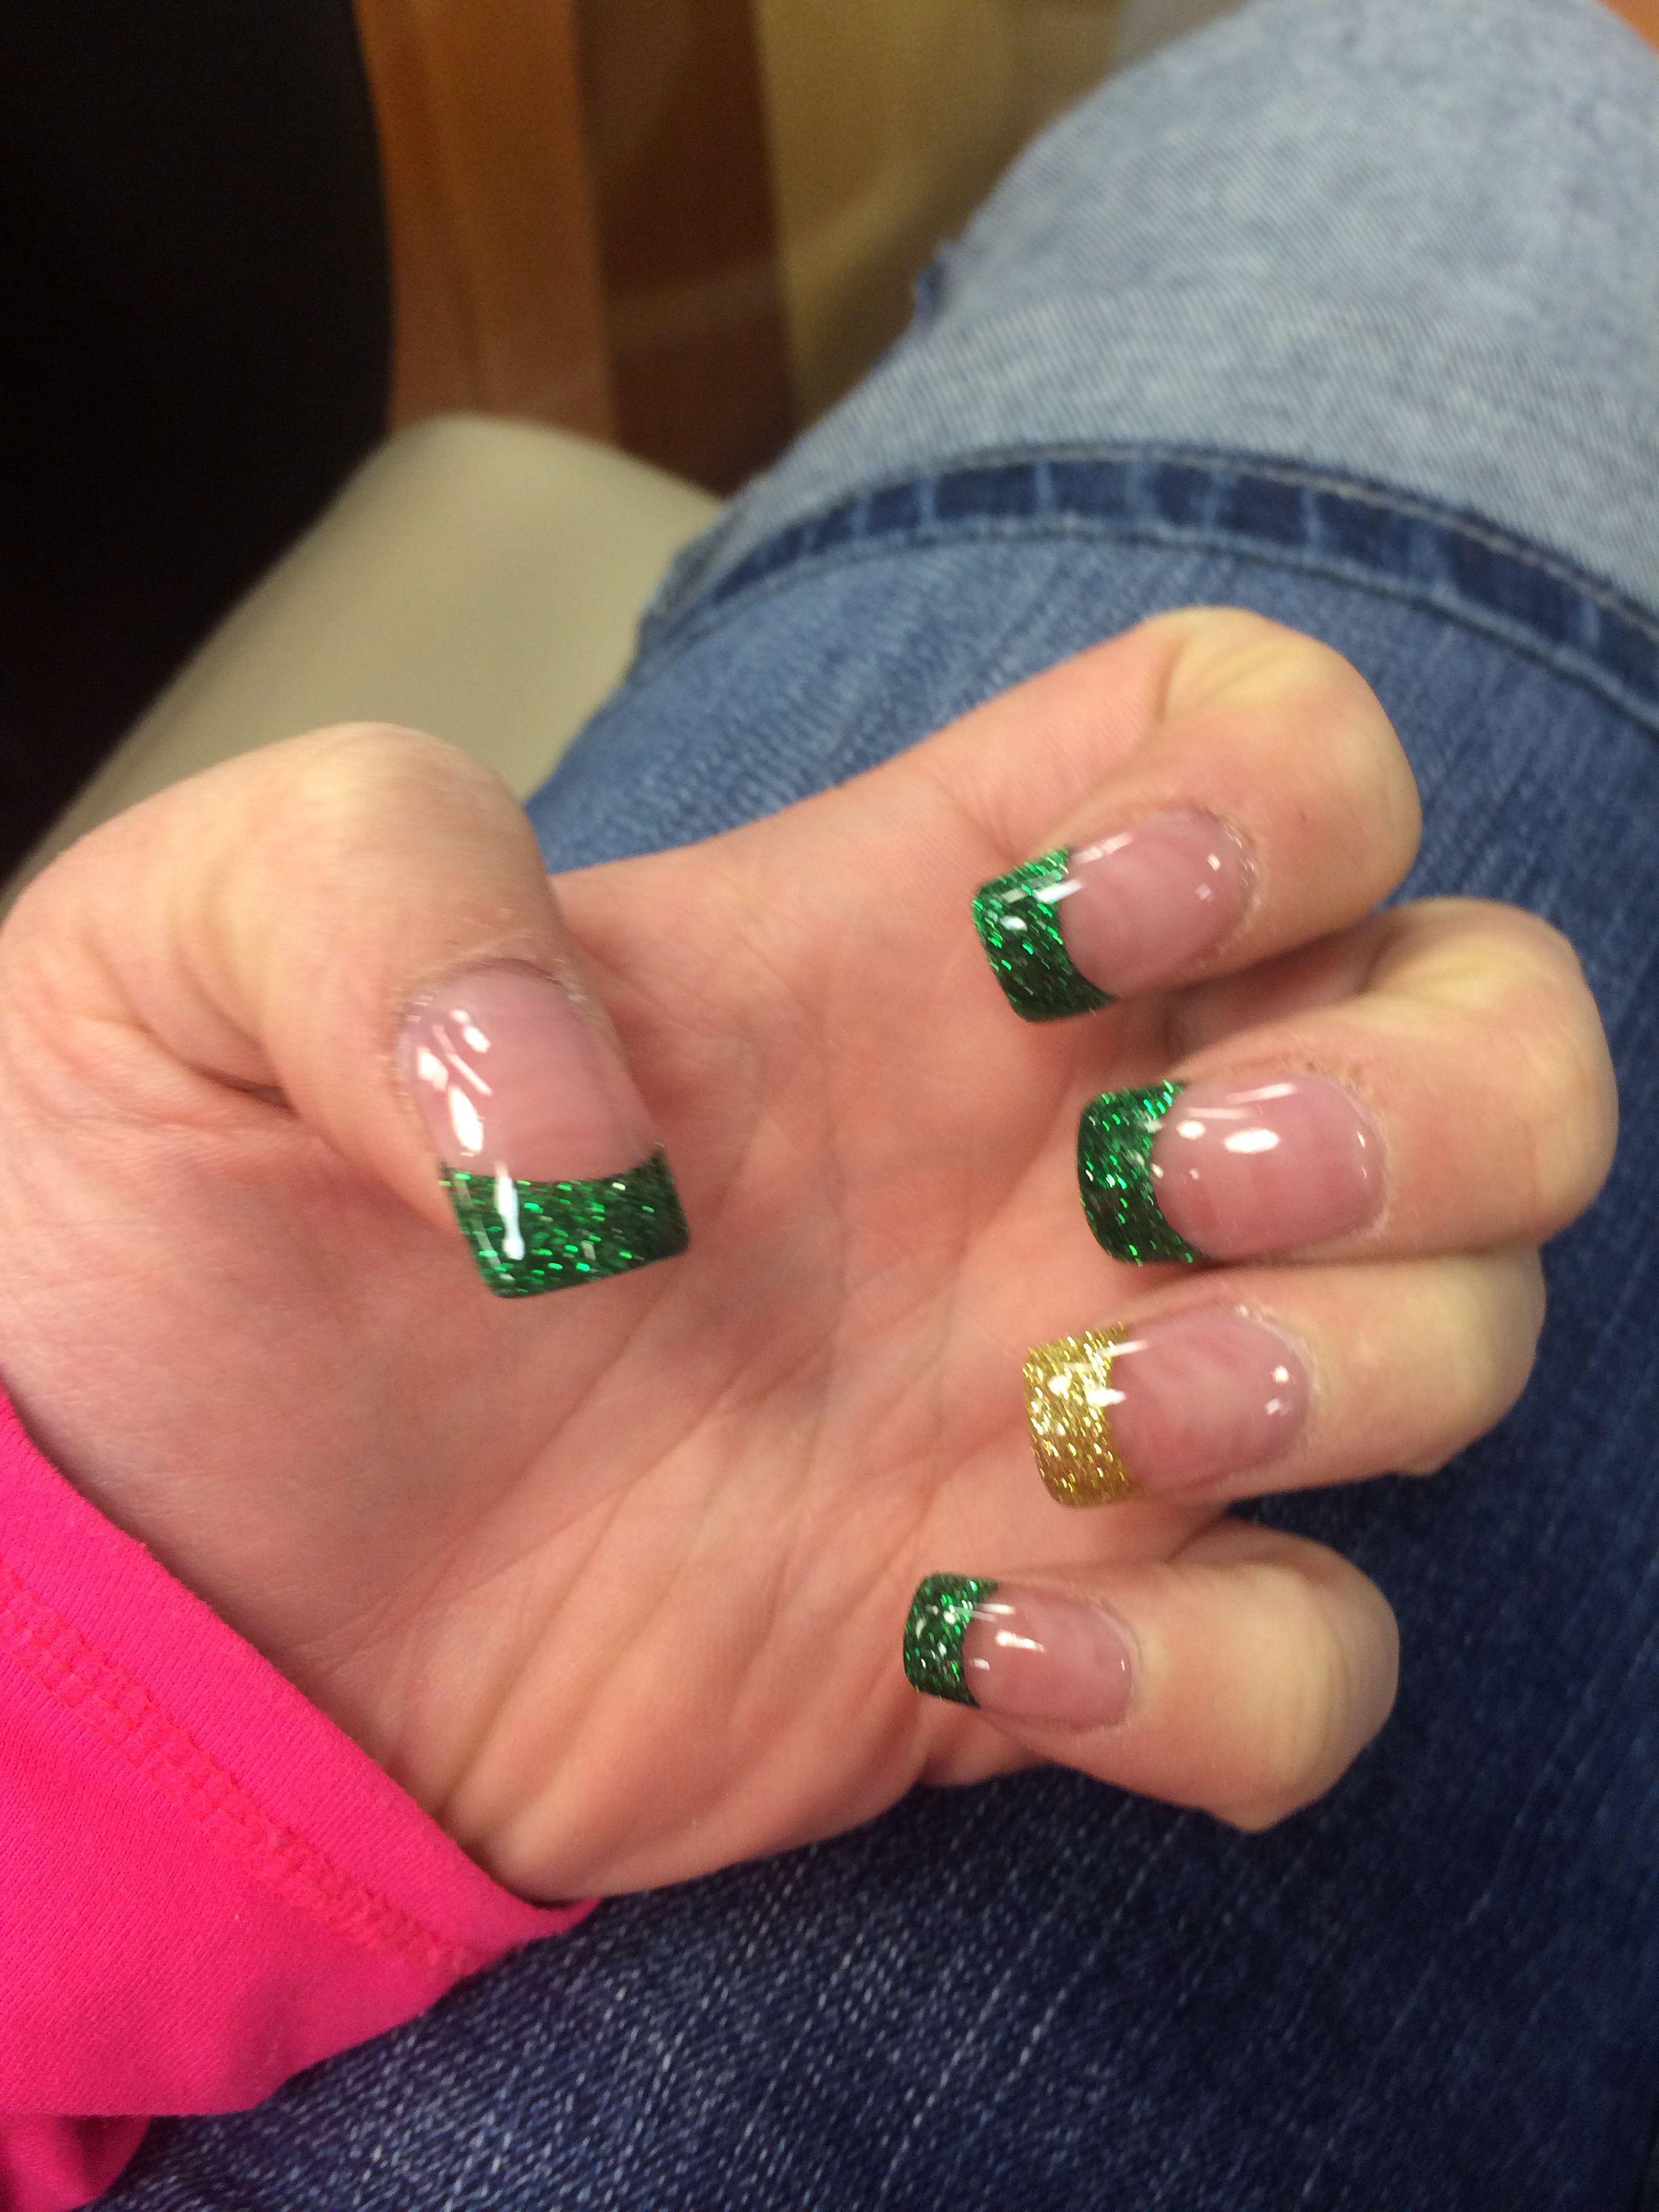 St. Patricks Day nails | St patricks day nails, St ...